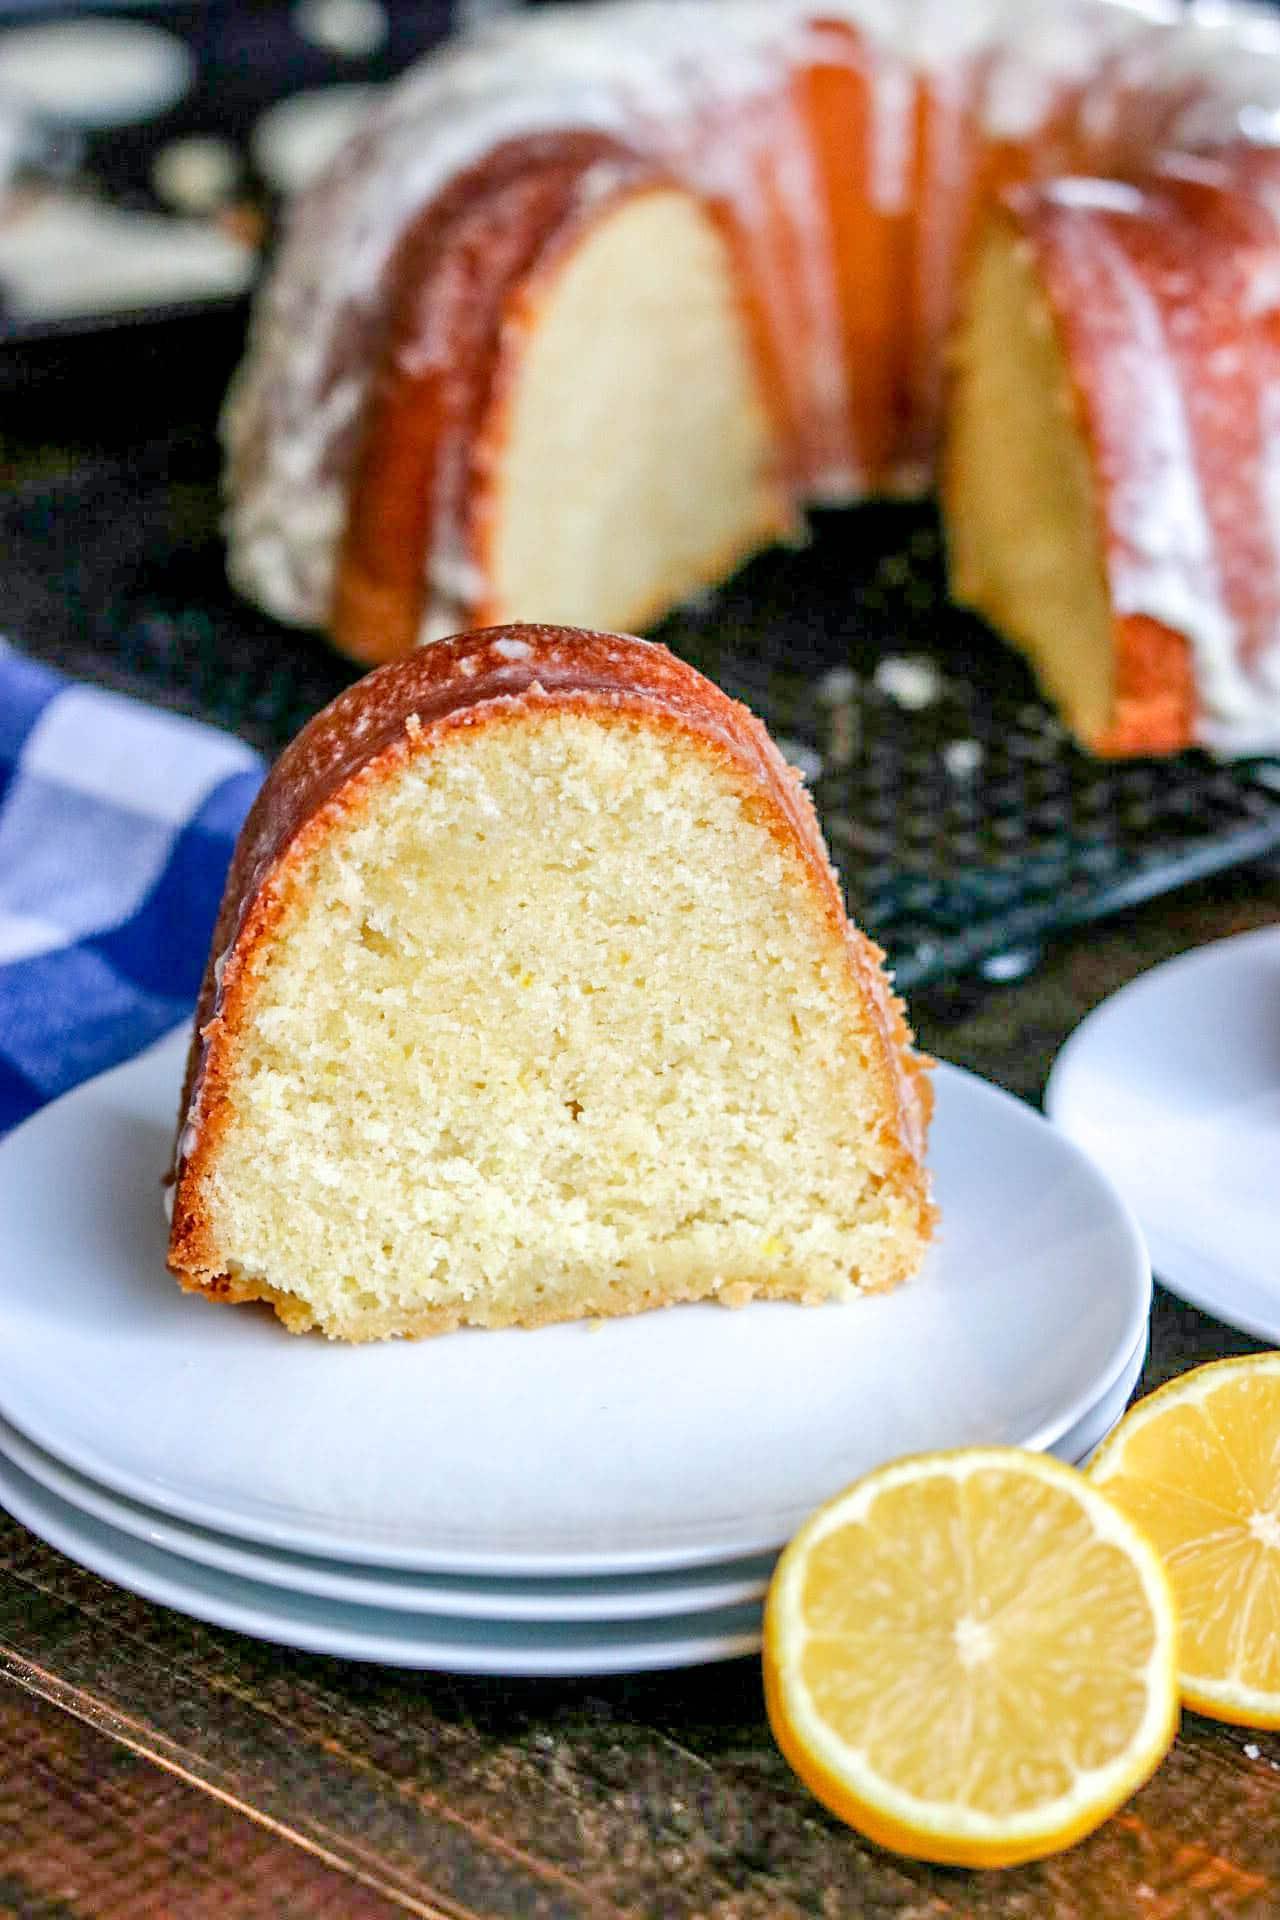 glazed lemon bundt cake slice on a plate with cut lemon and a blue napkin